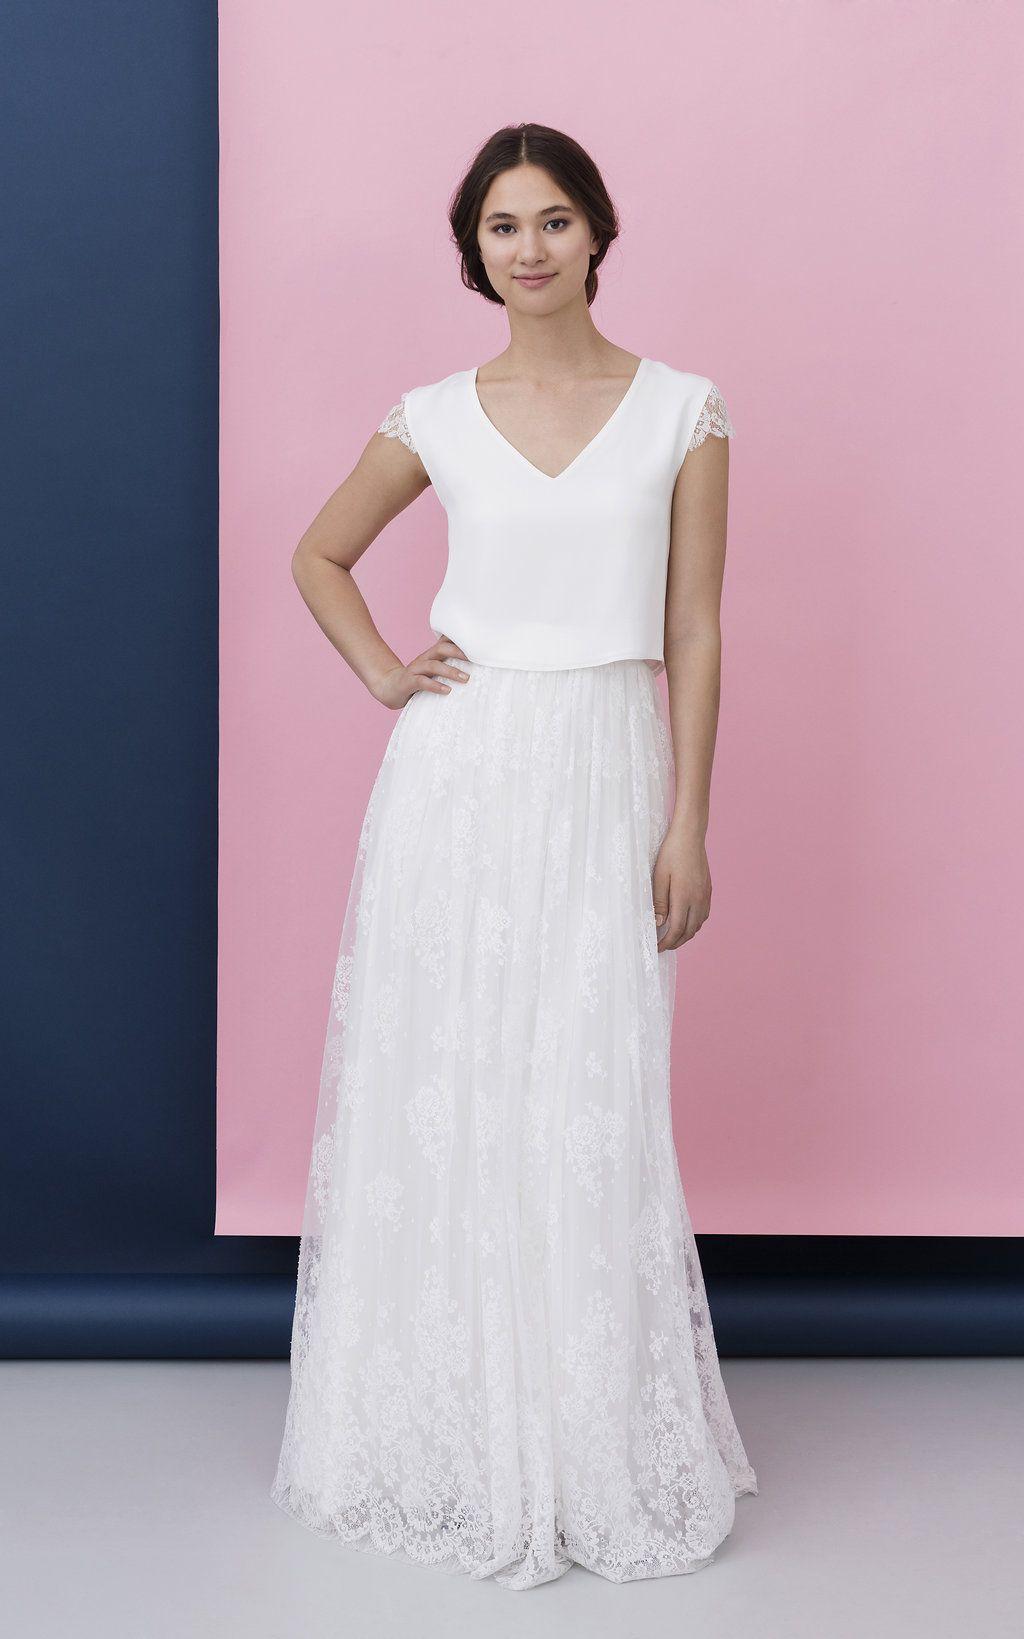 kisui Brautkleid Kollektion 2017 | Weddings, Wedding and Wedding dress